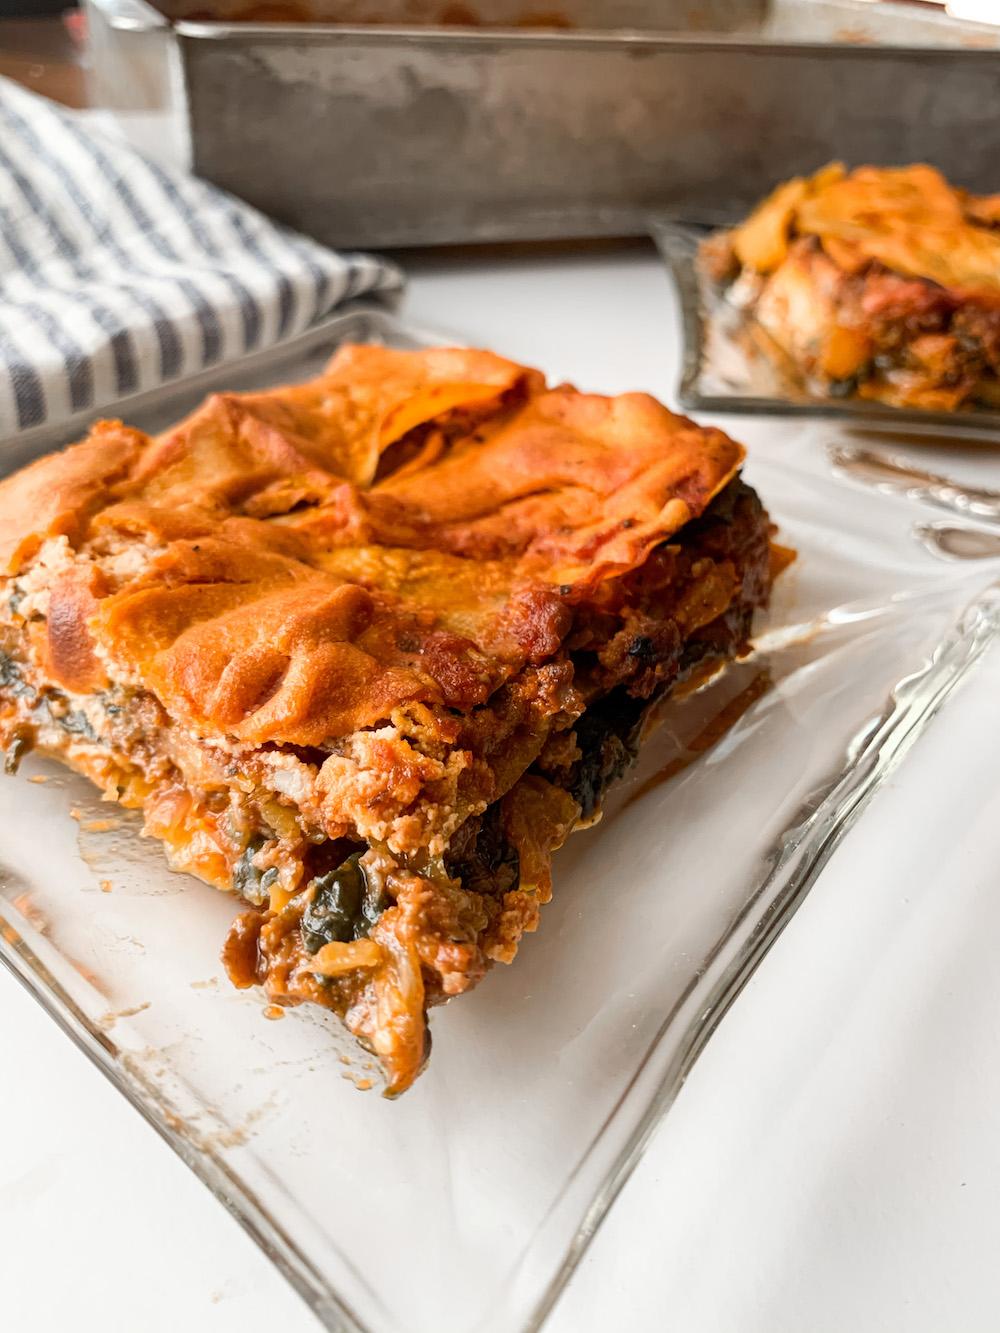 Plate of dairy-free lasagna